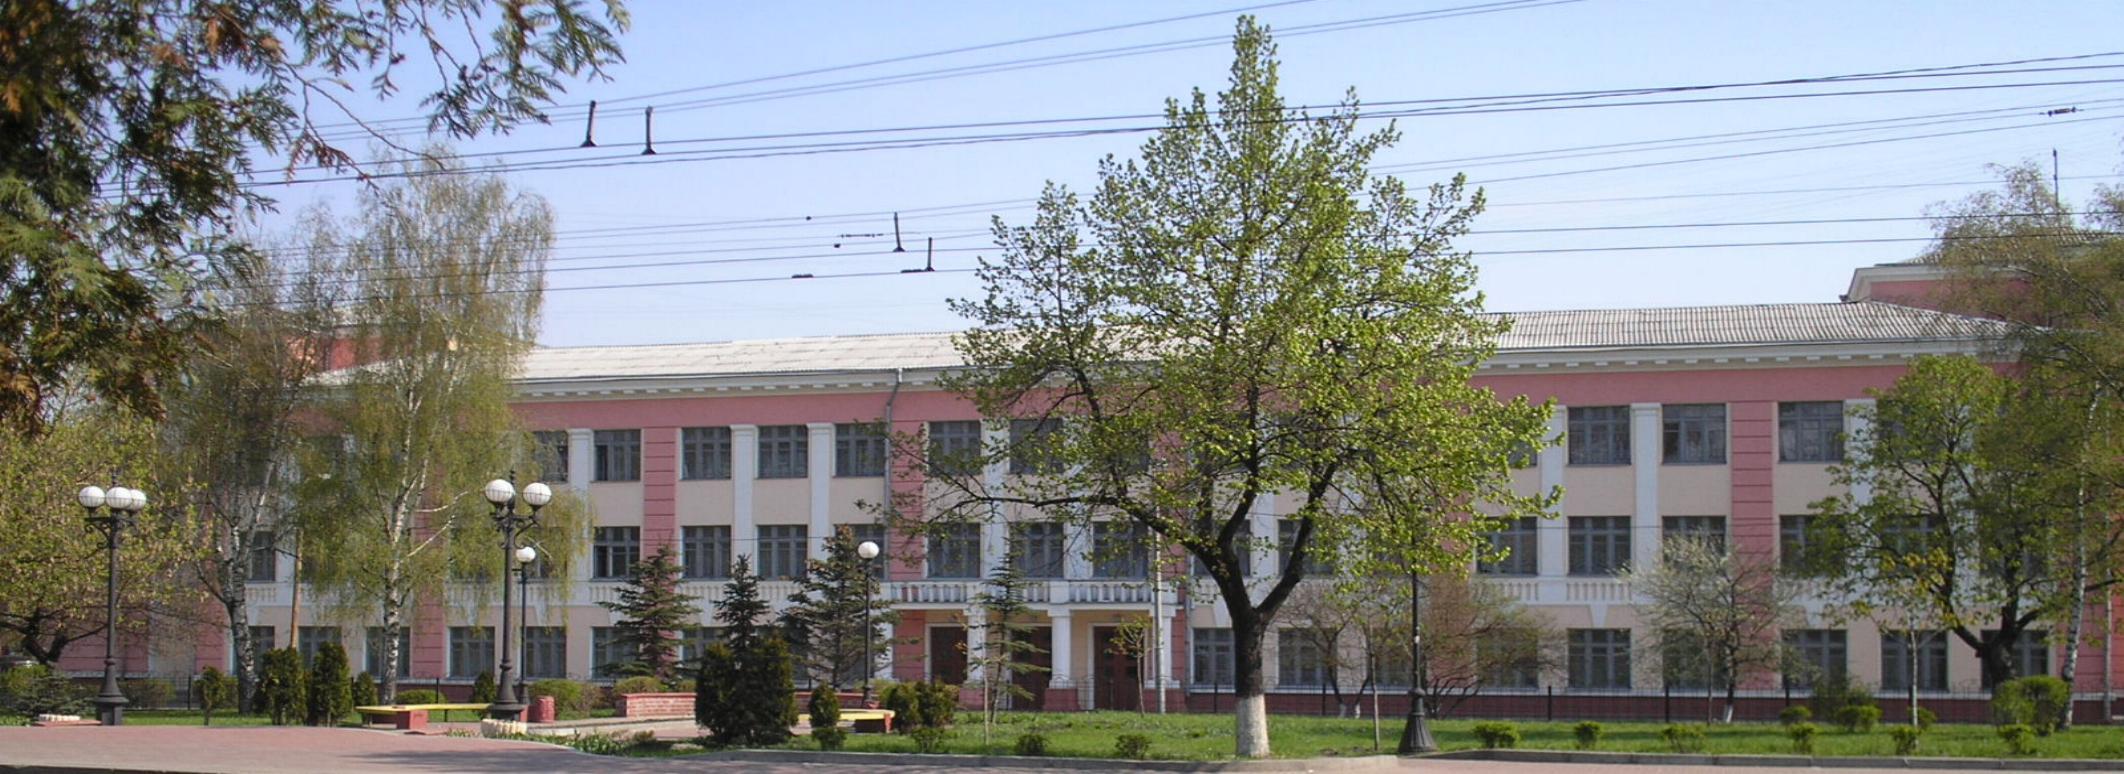 Персональный сайт школи №8 м.Києва - Головна сторінка 70d157e15ab7e